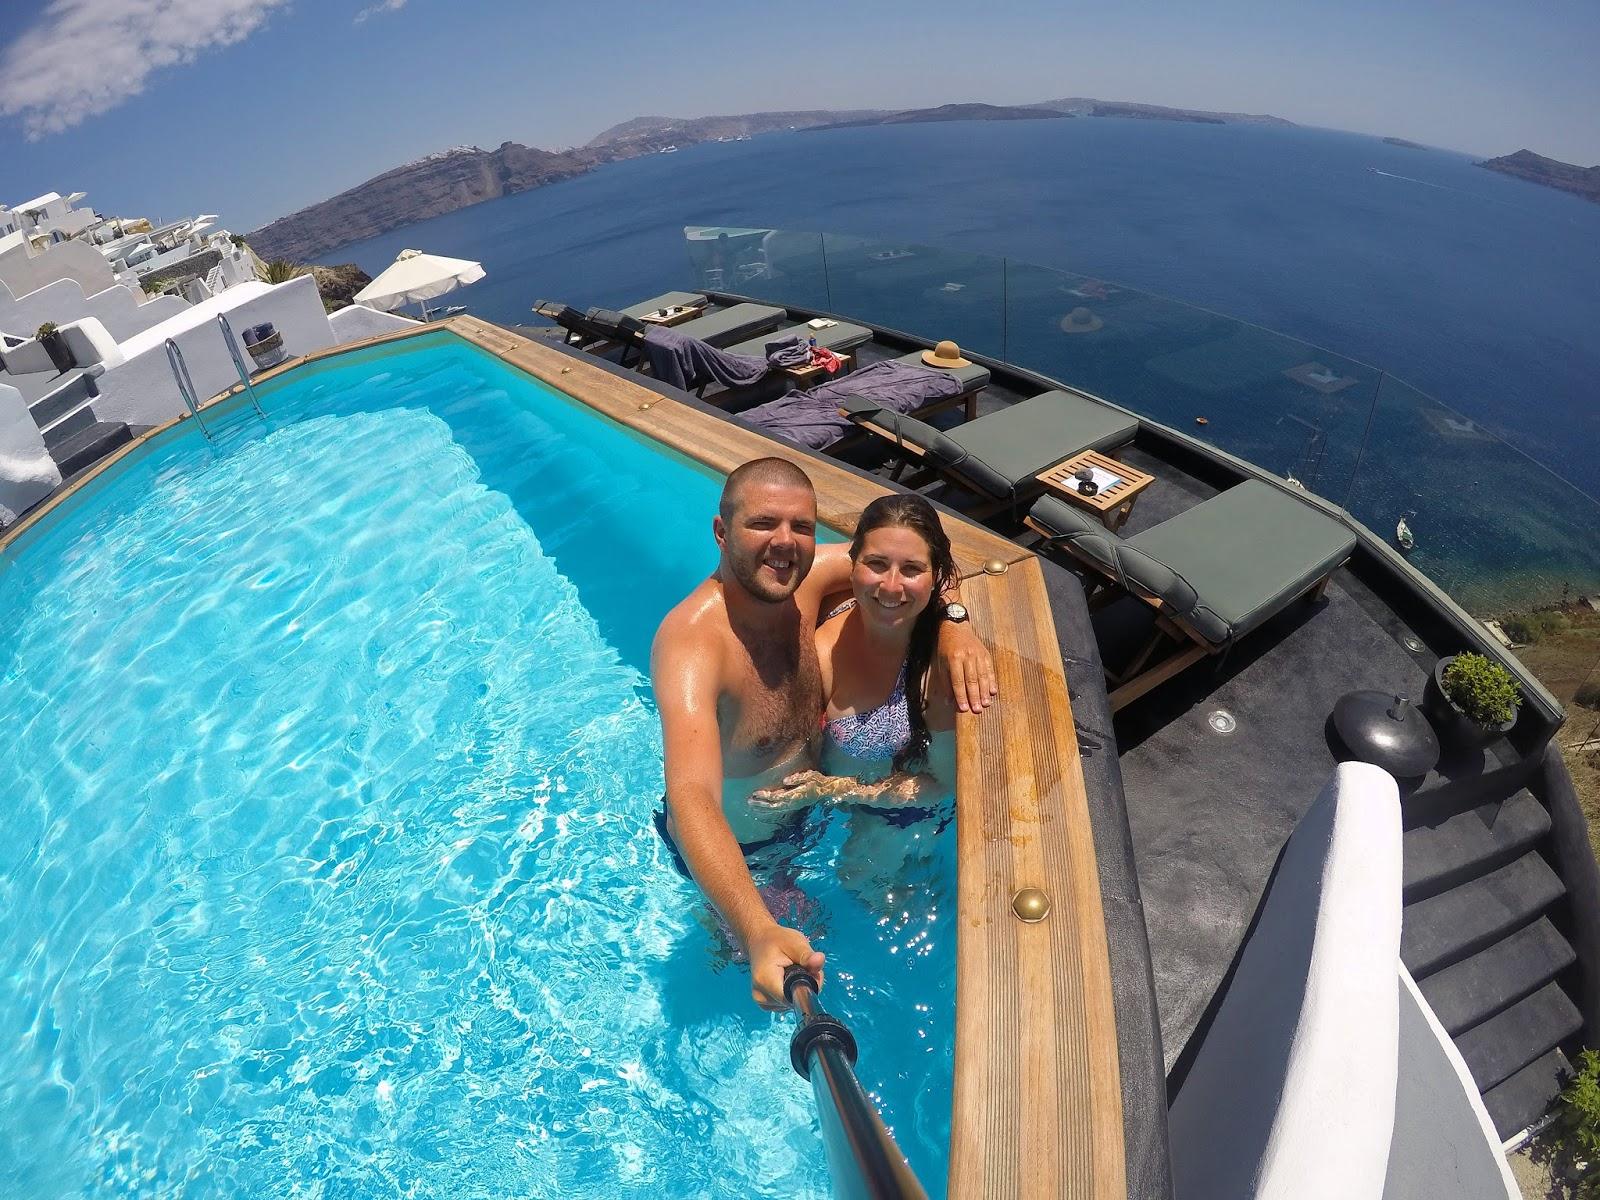 Couple in pool at Nostos Apartments Oia Santorini